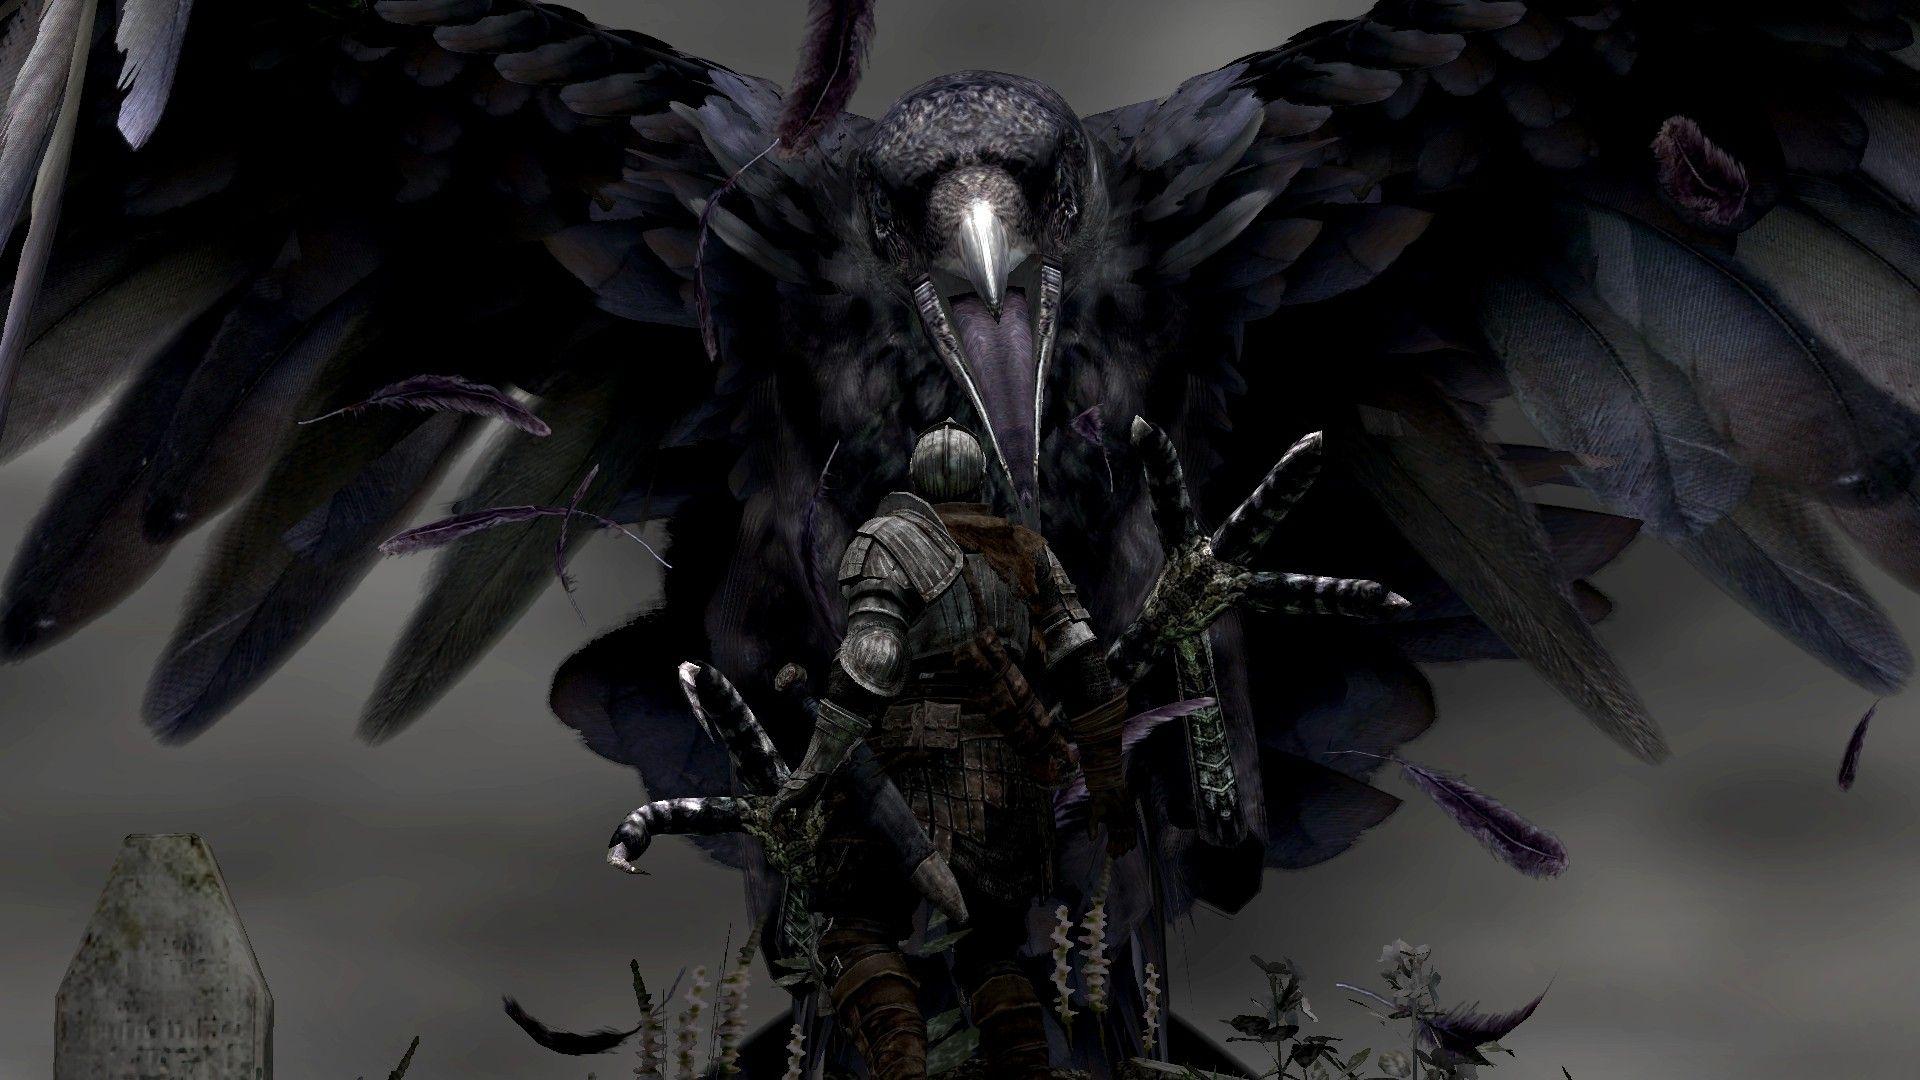 4da06e29 raven woman art | Wallpapers :: dark, giant, fantasy art, grab ...